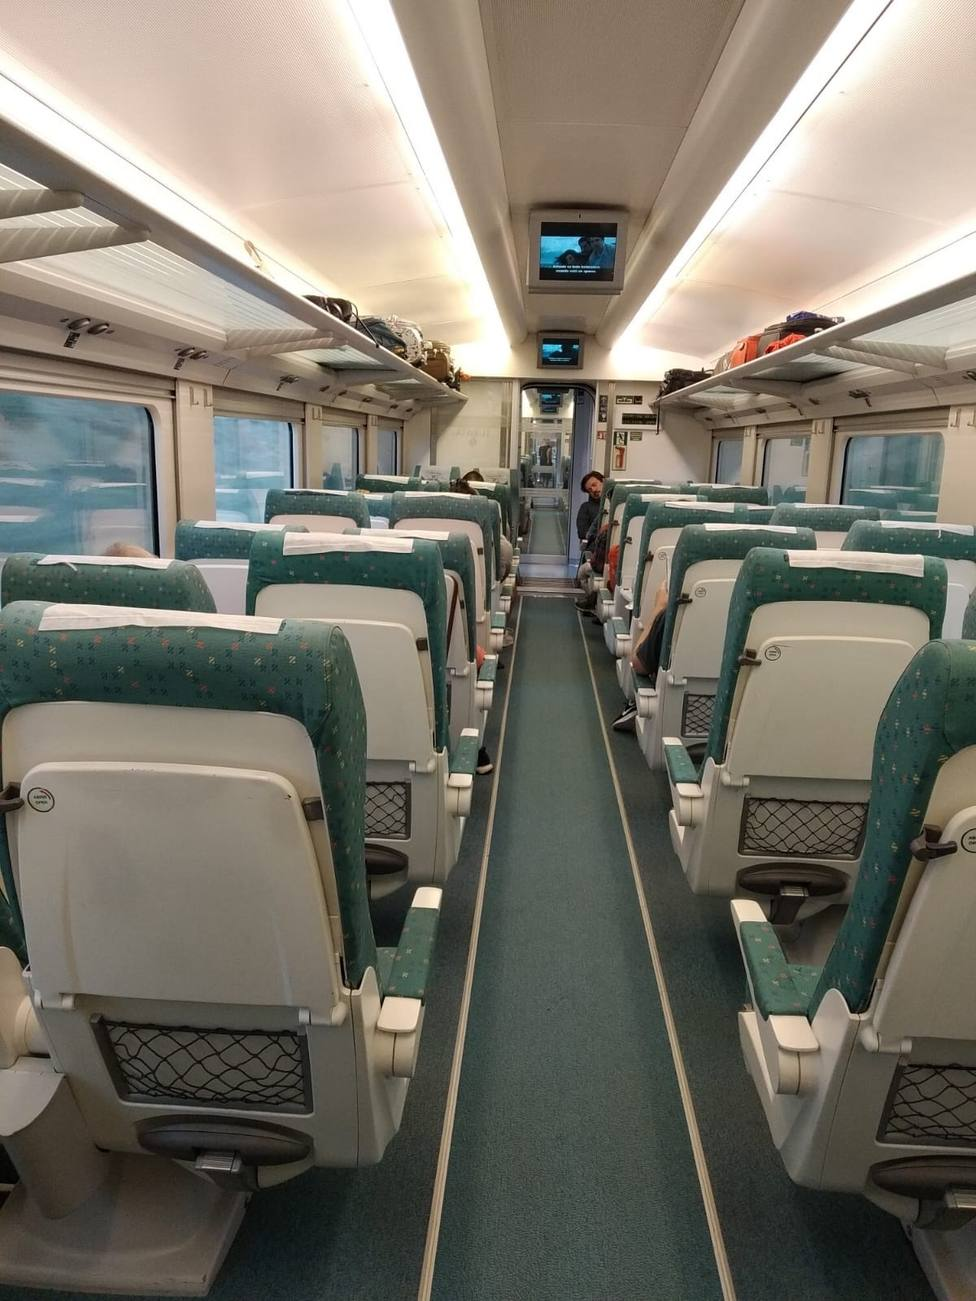 Interior de un tren ALVIA